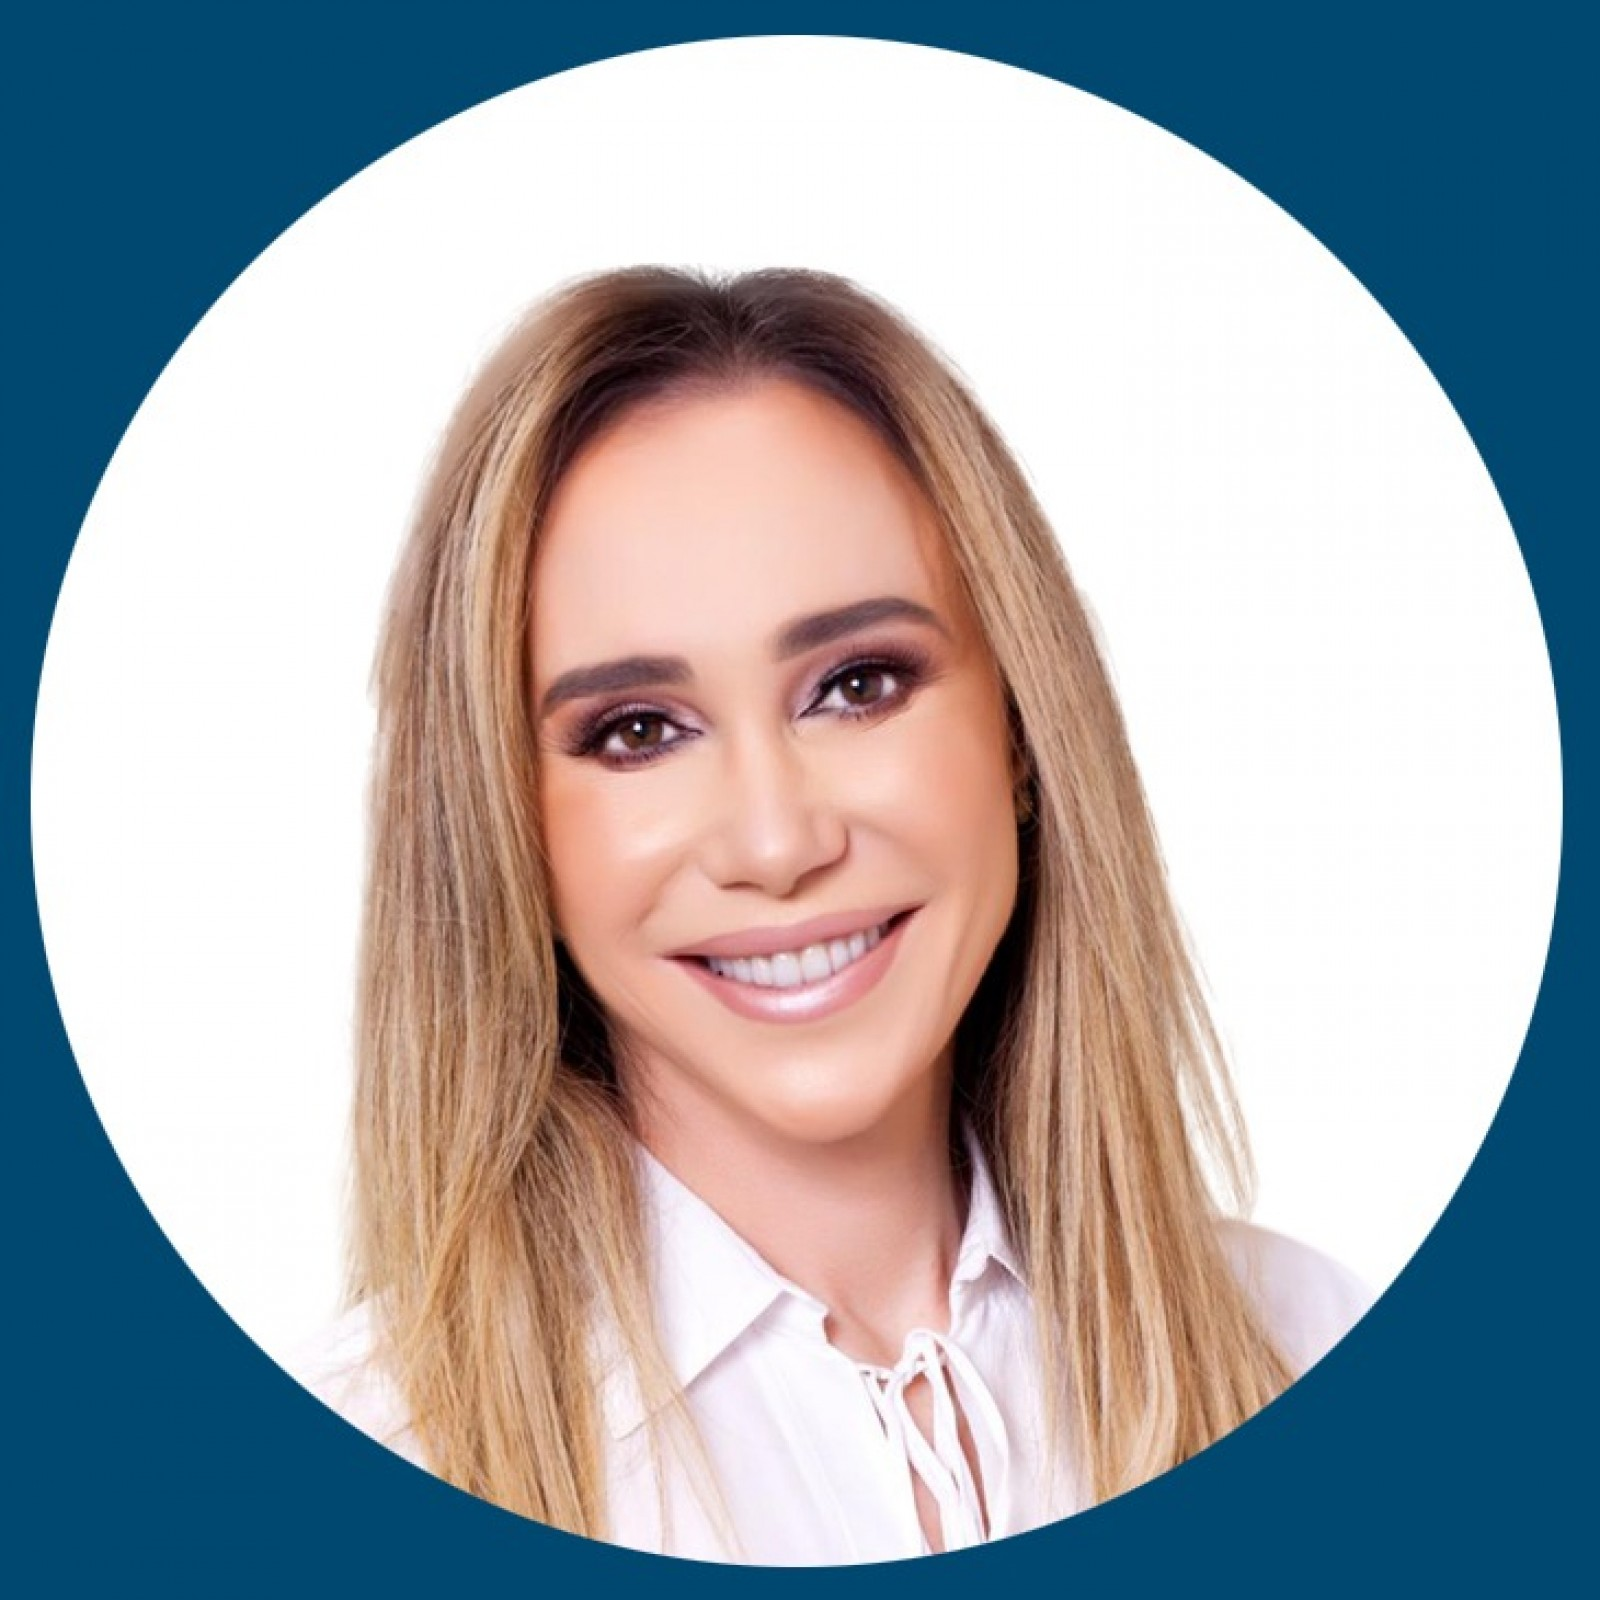 Dra. Teresa Scardua